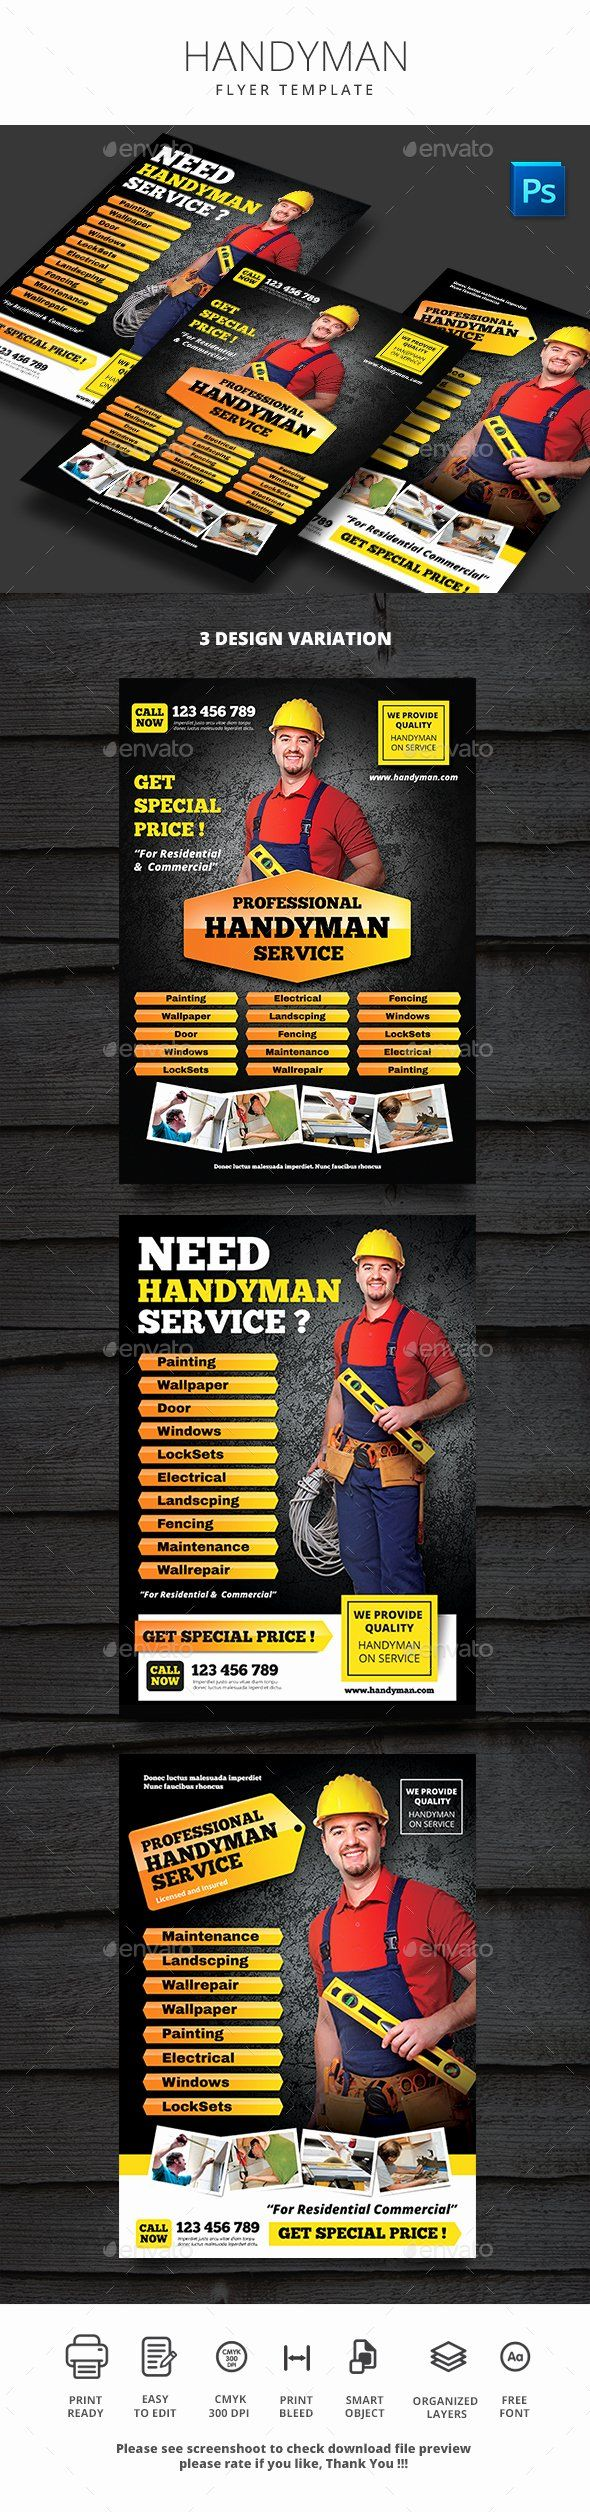 Handyman Flyer Templates Free Download Awesome Handyman